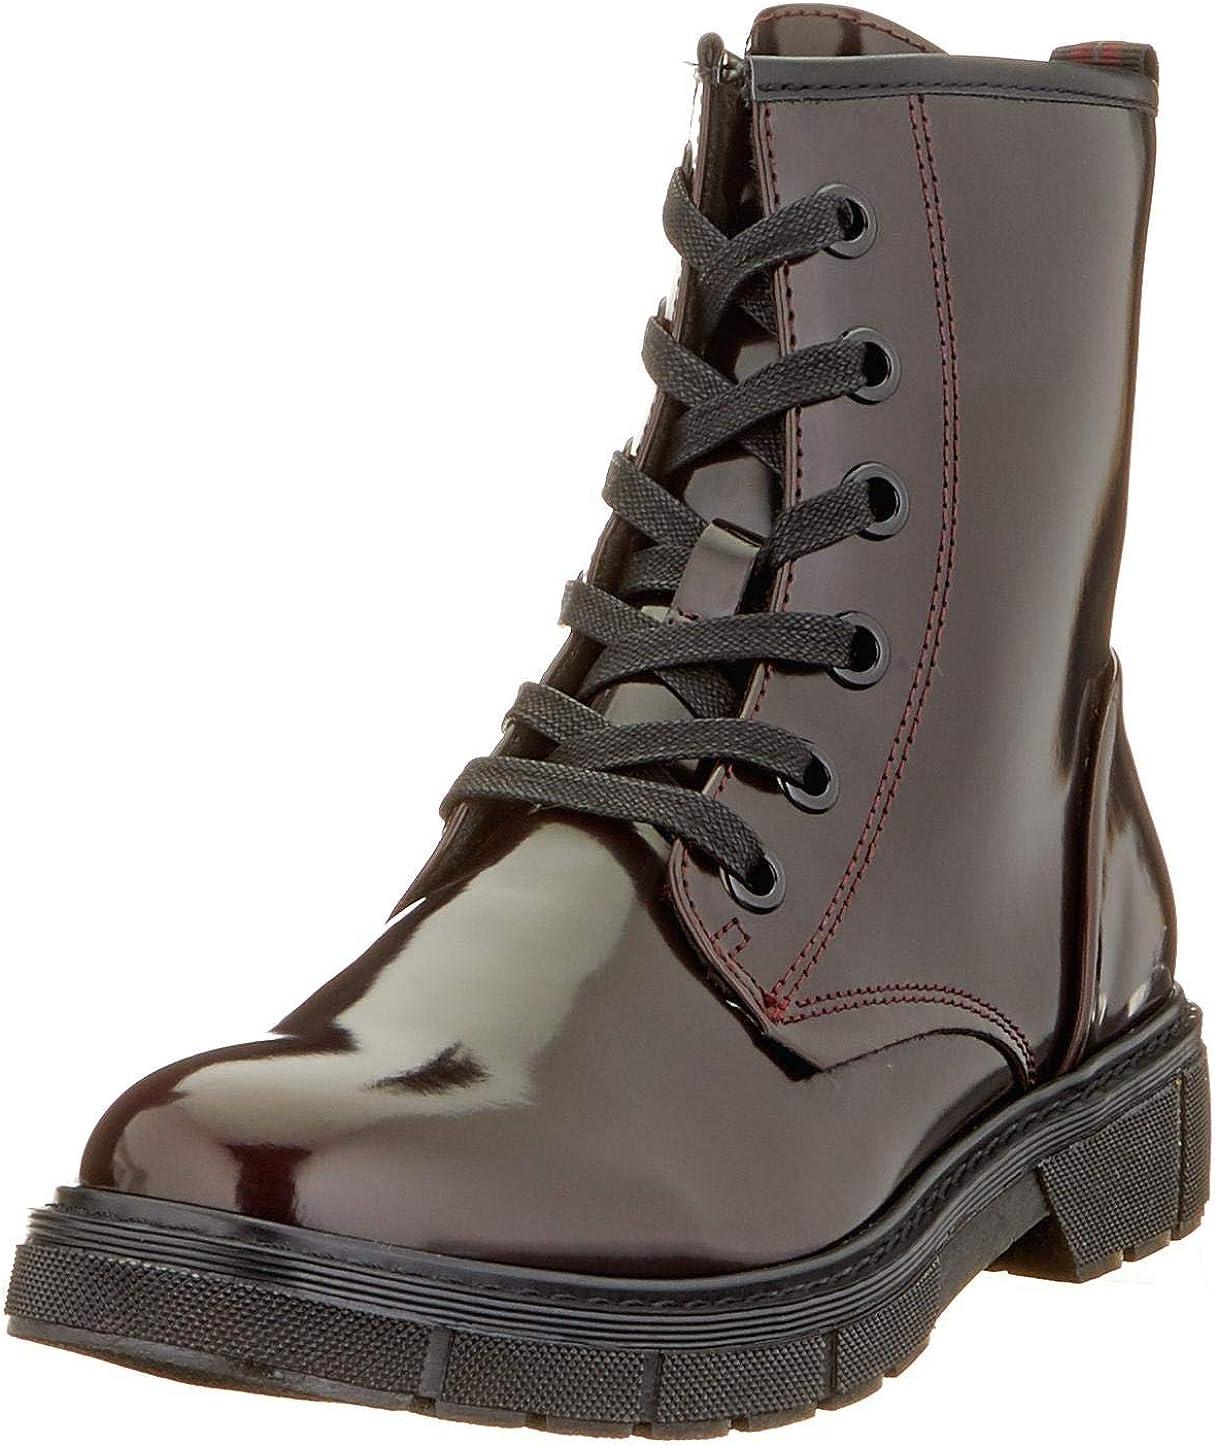 Marco Tozzi Women's Combat Boots Ankle